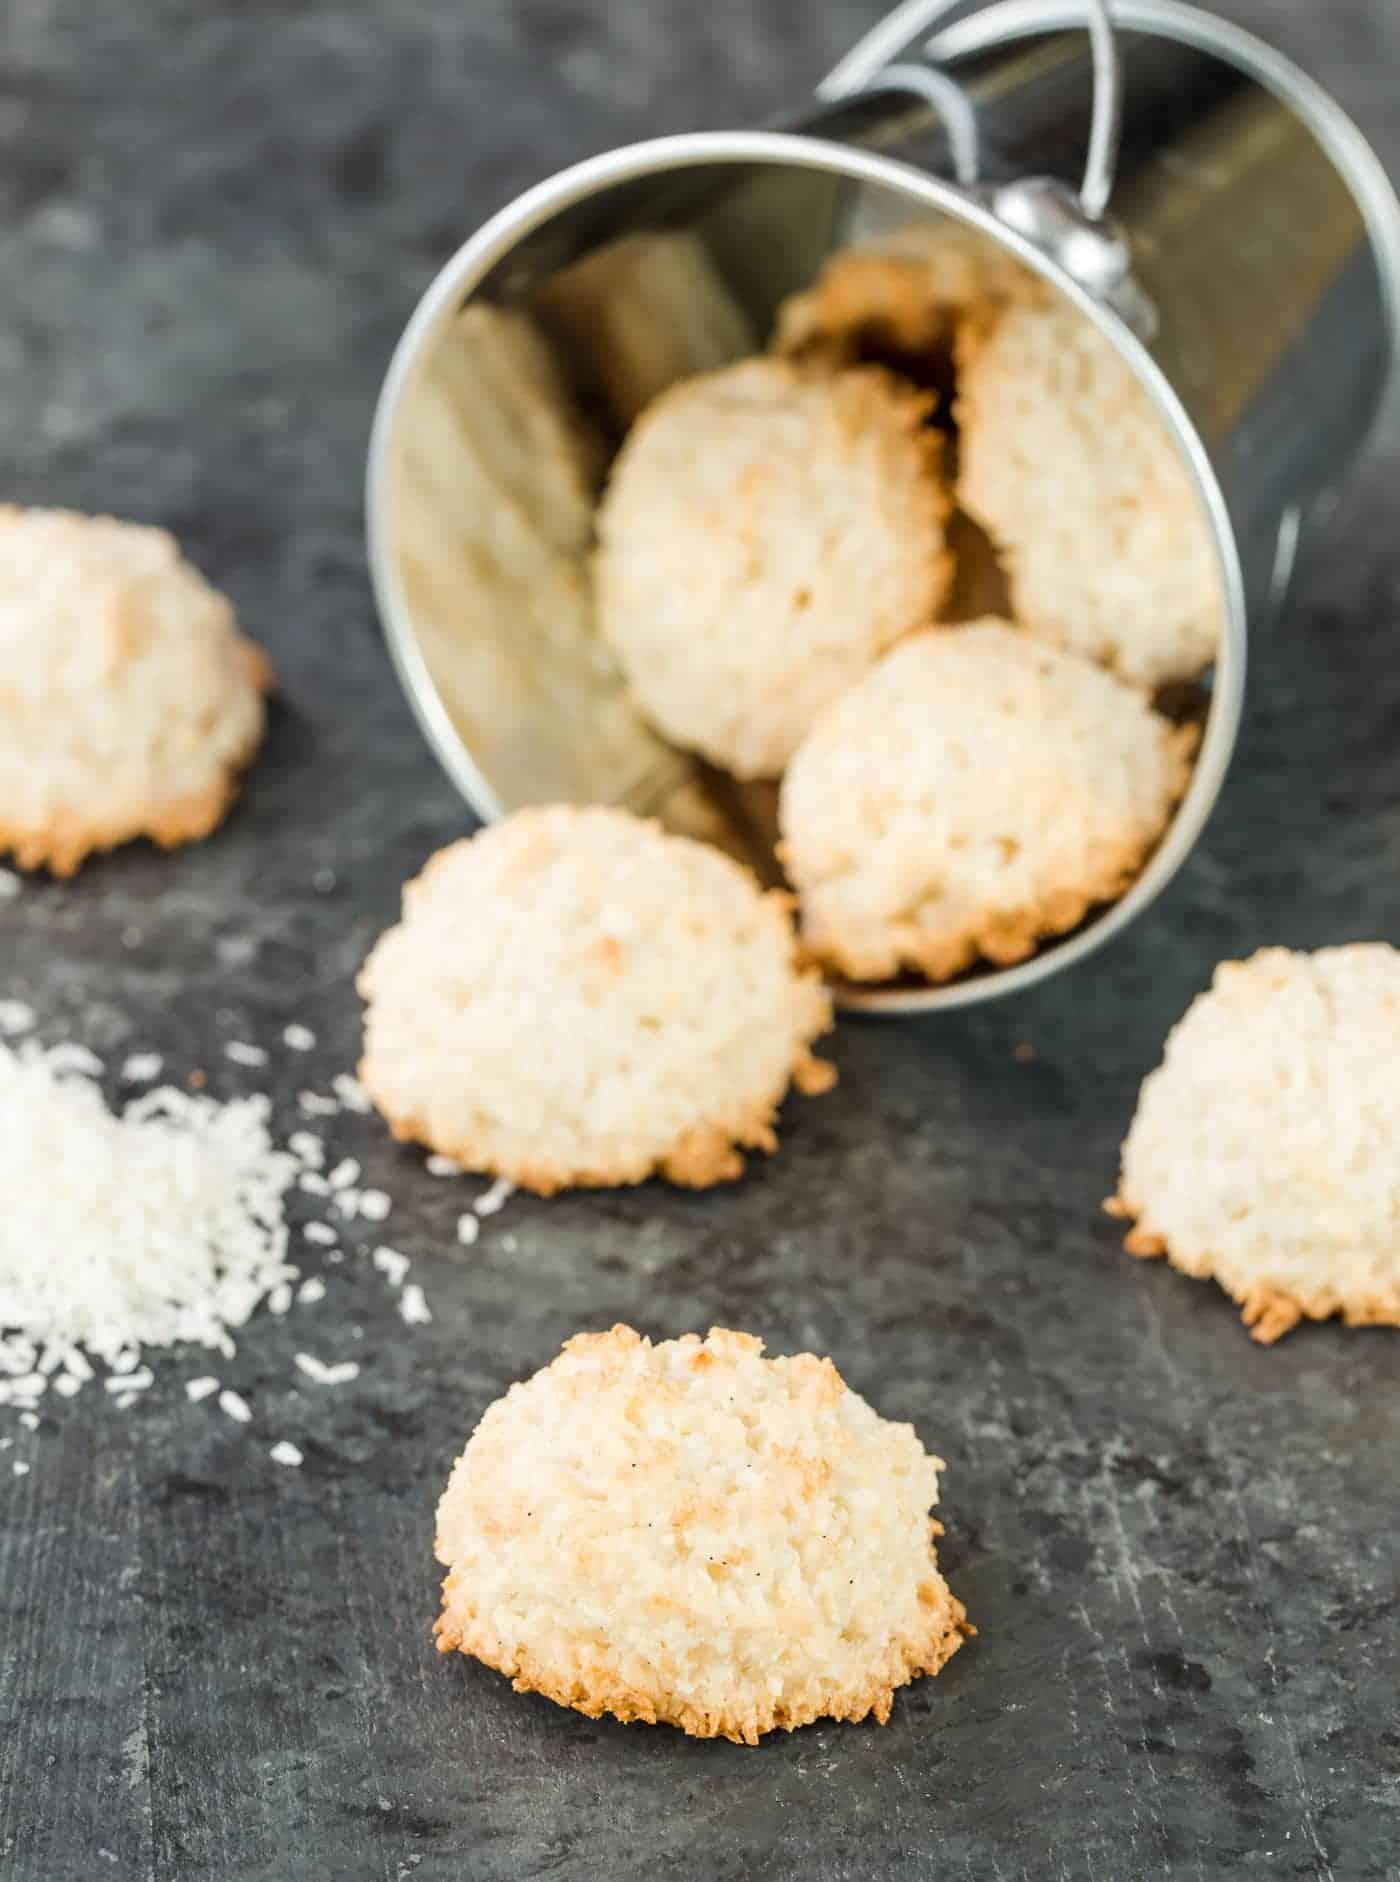 Coconut Macaroons - Garnish with Lemon